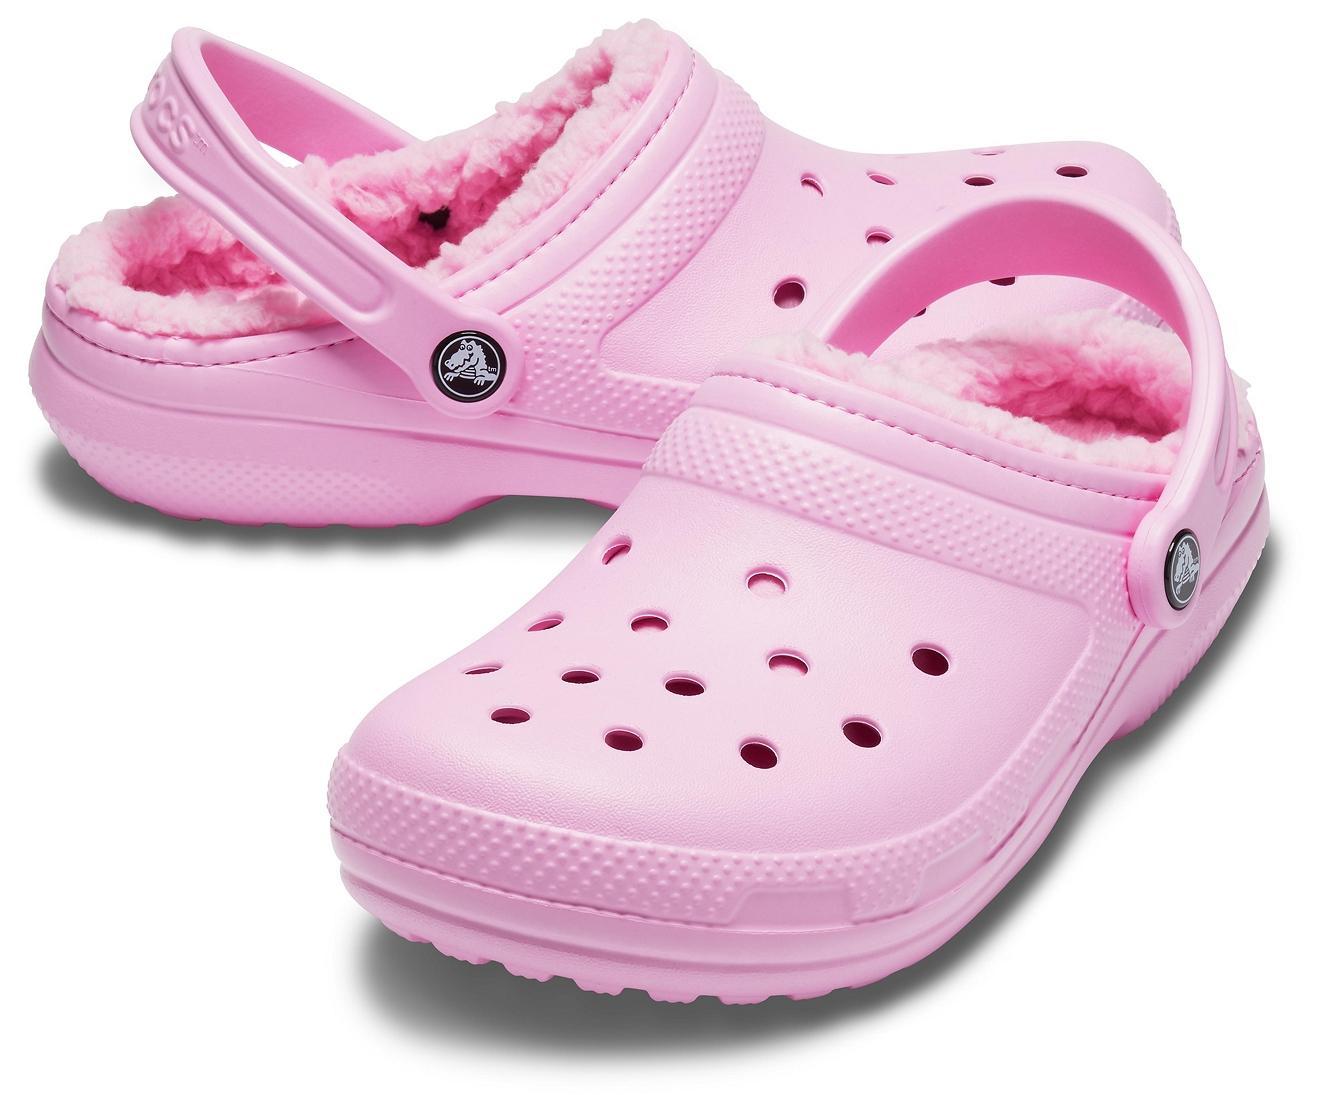 fur lined crocs pink Shop Clothing